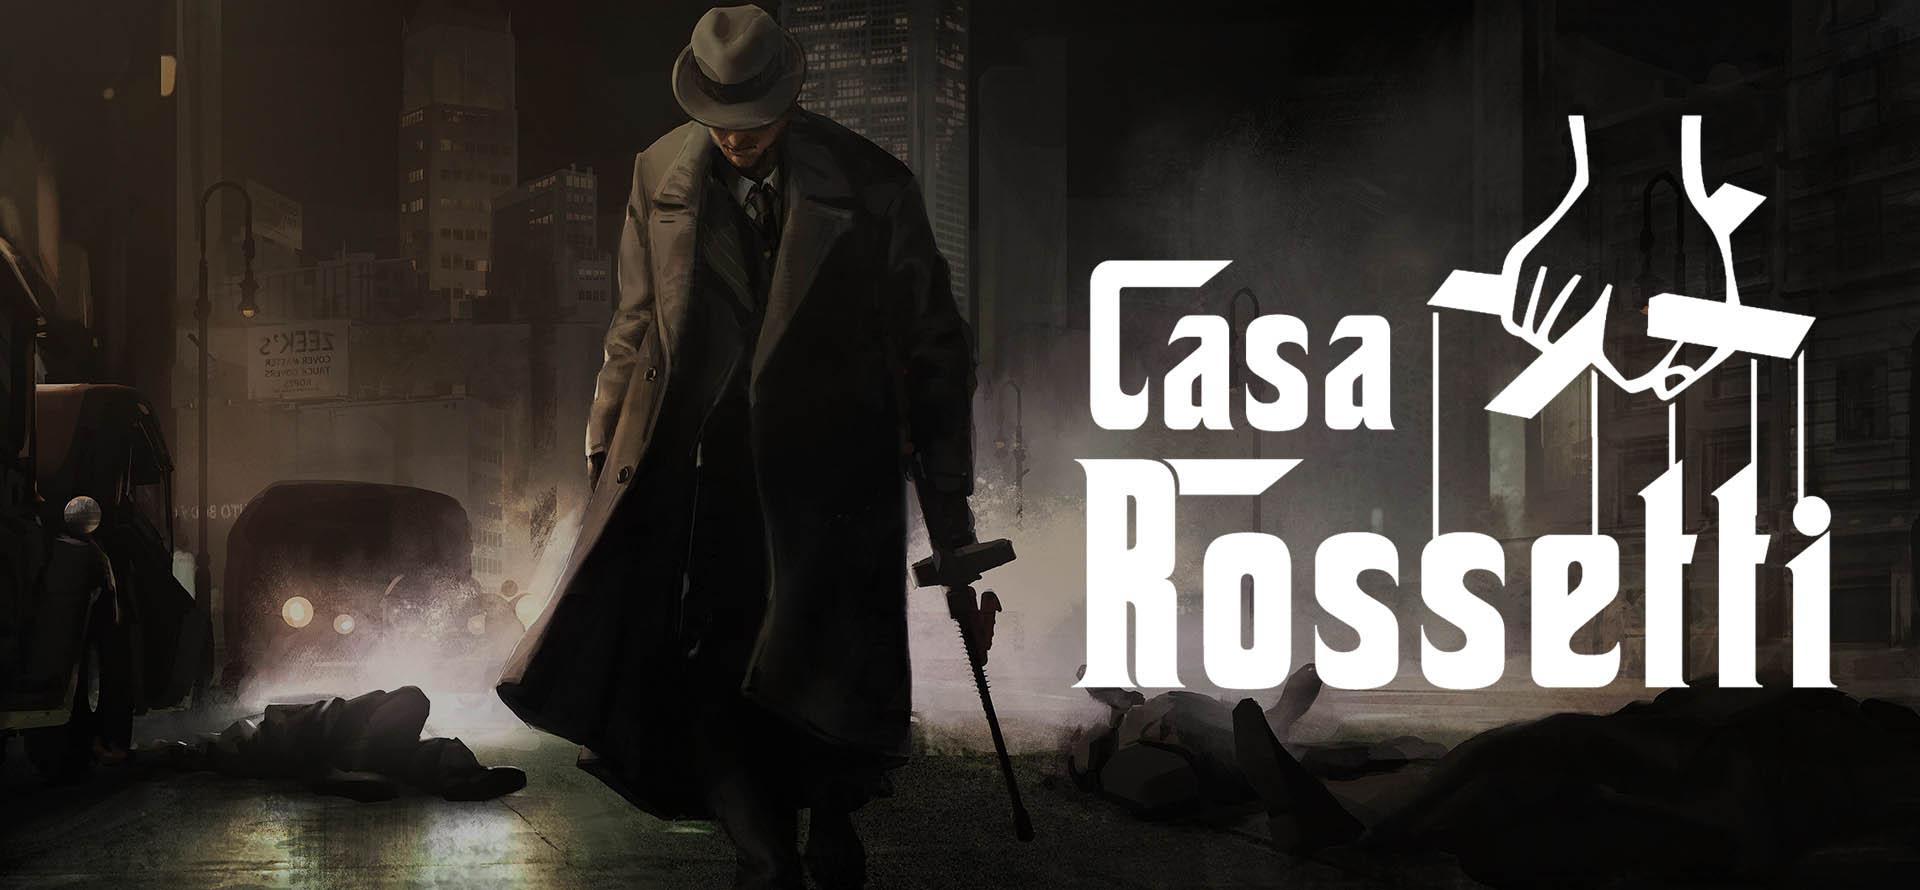 Casa-Rossetti-1920x890-1